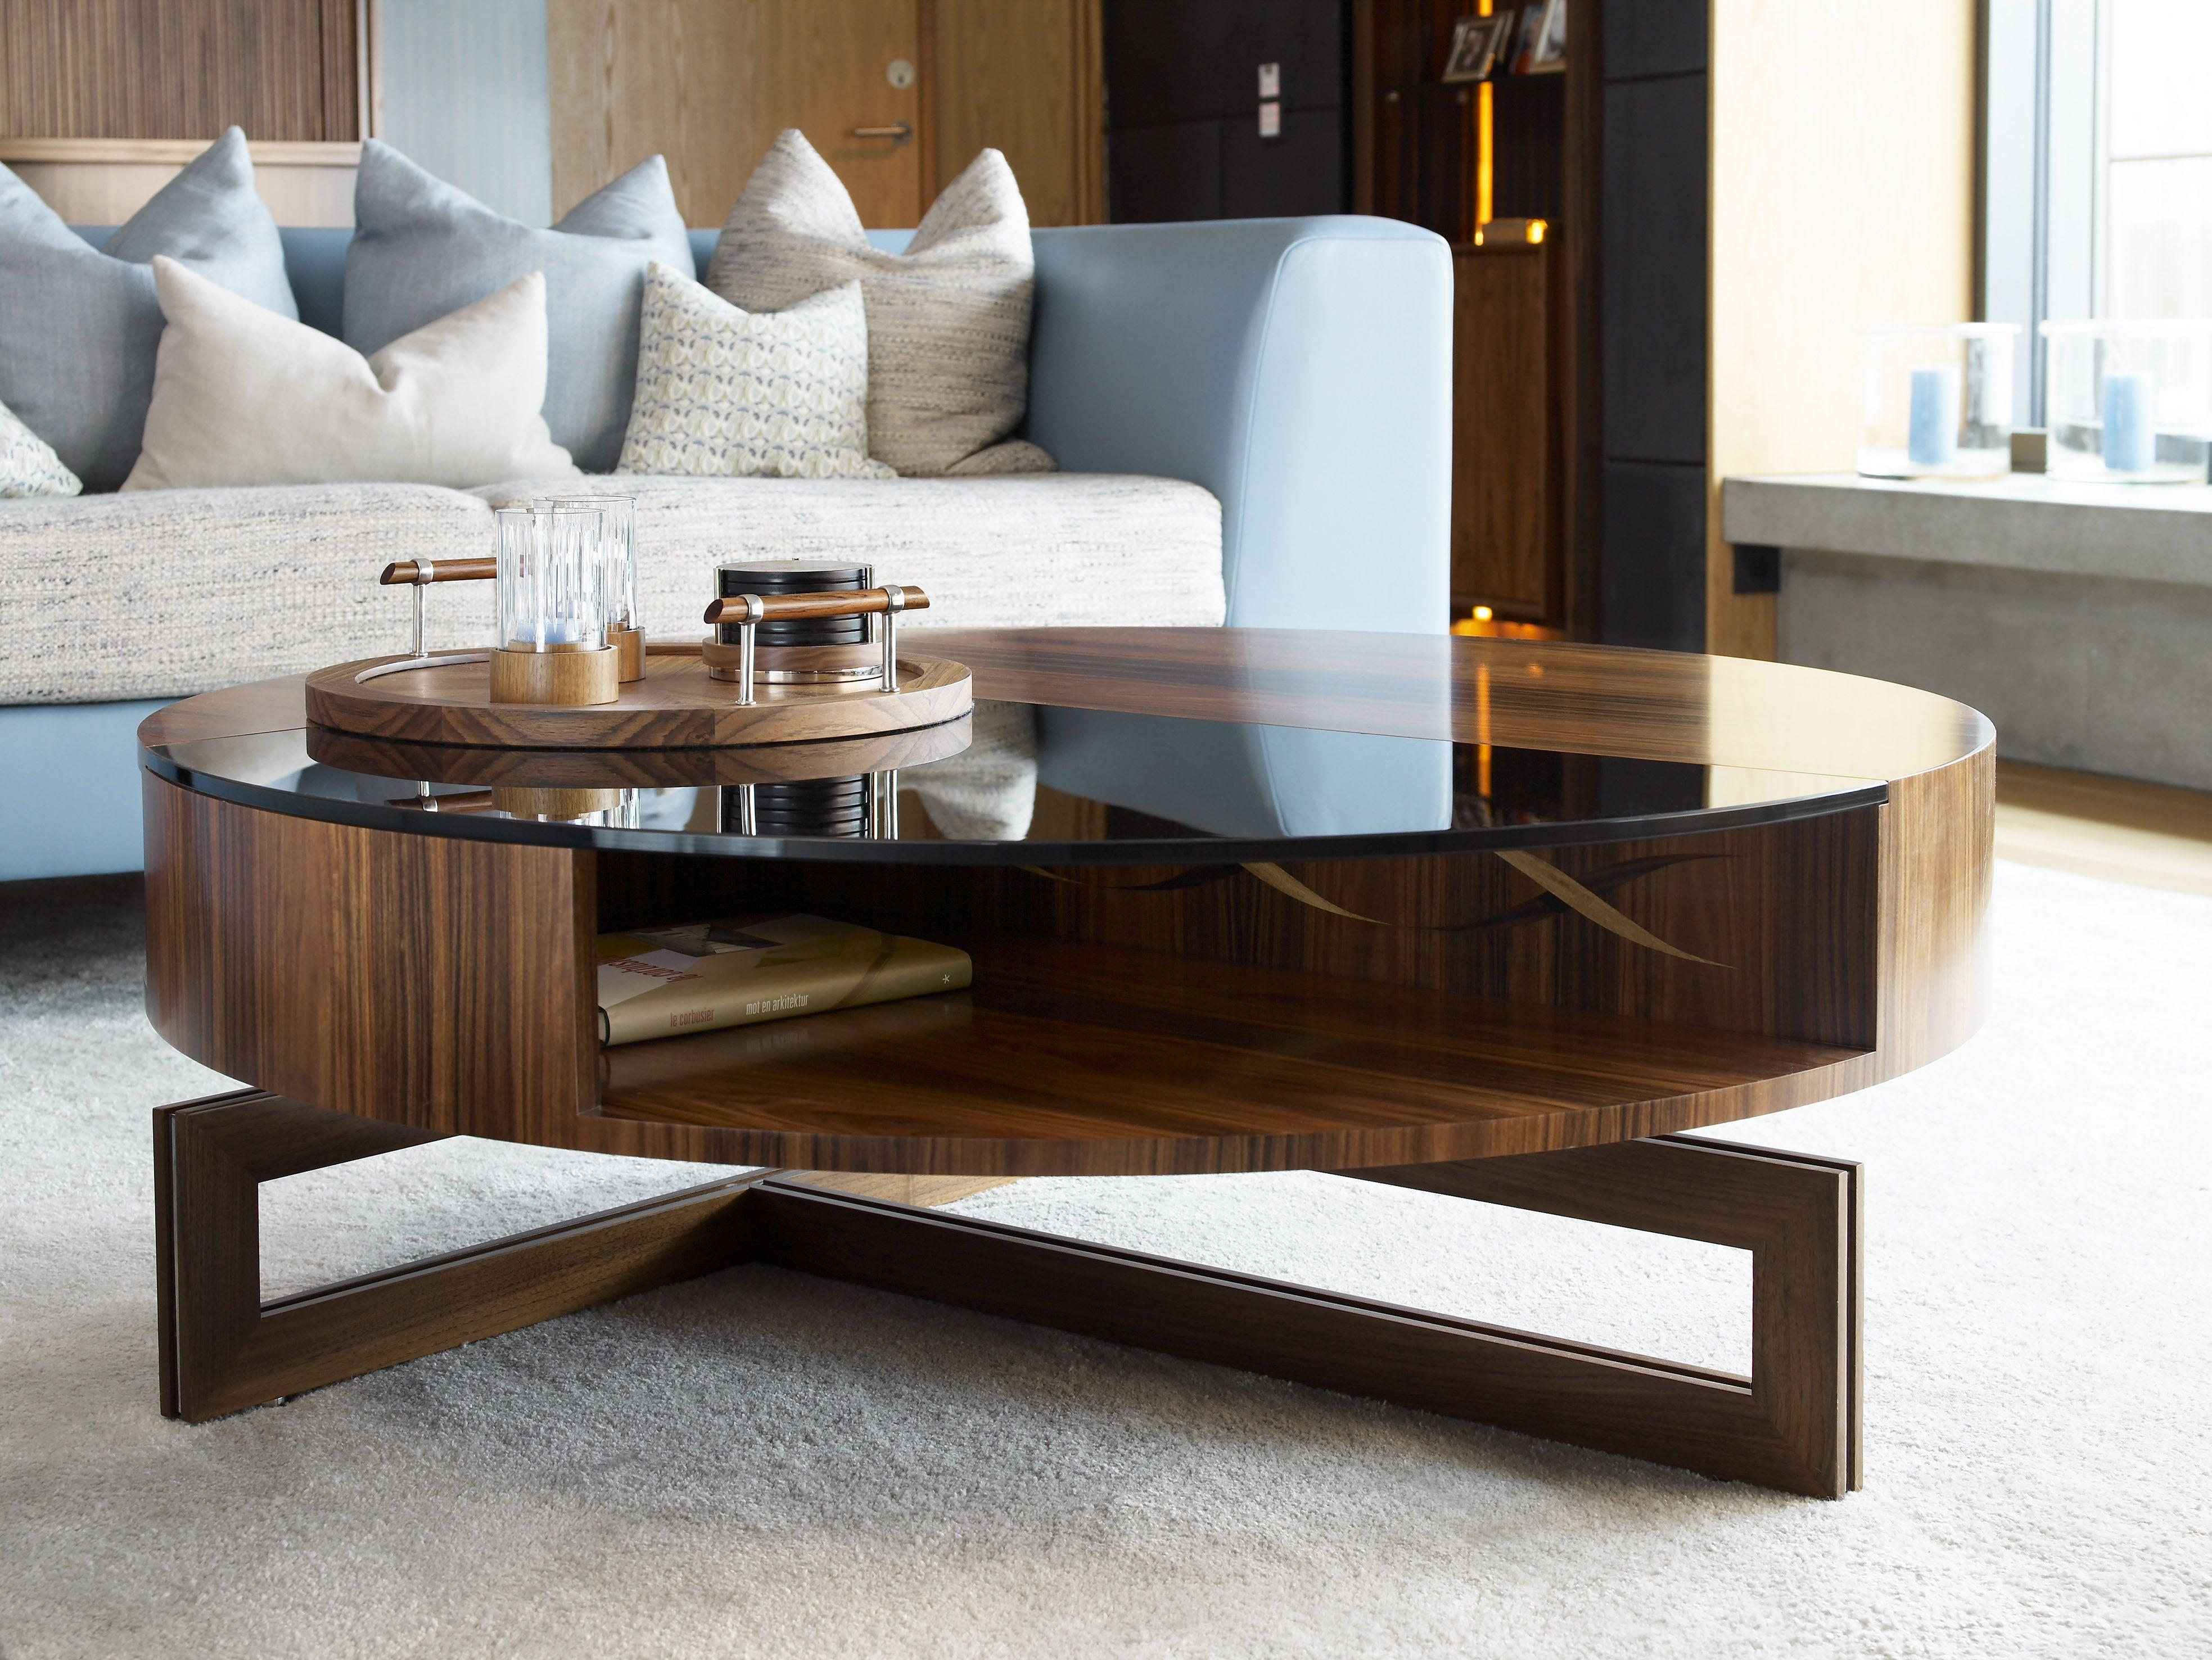 Oslo Luxury Interior Design Reception room